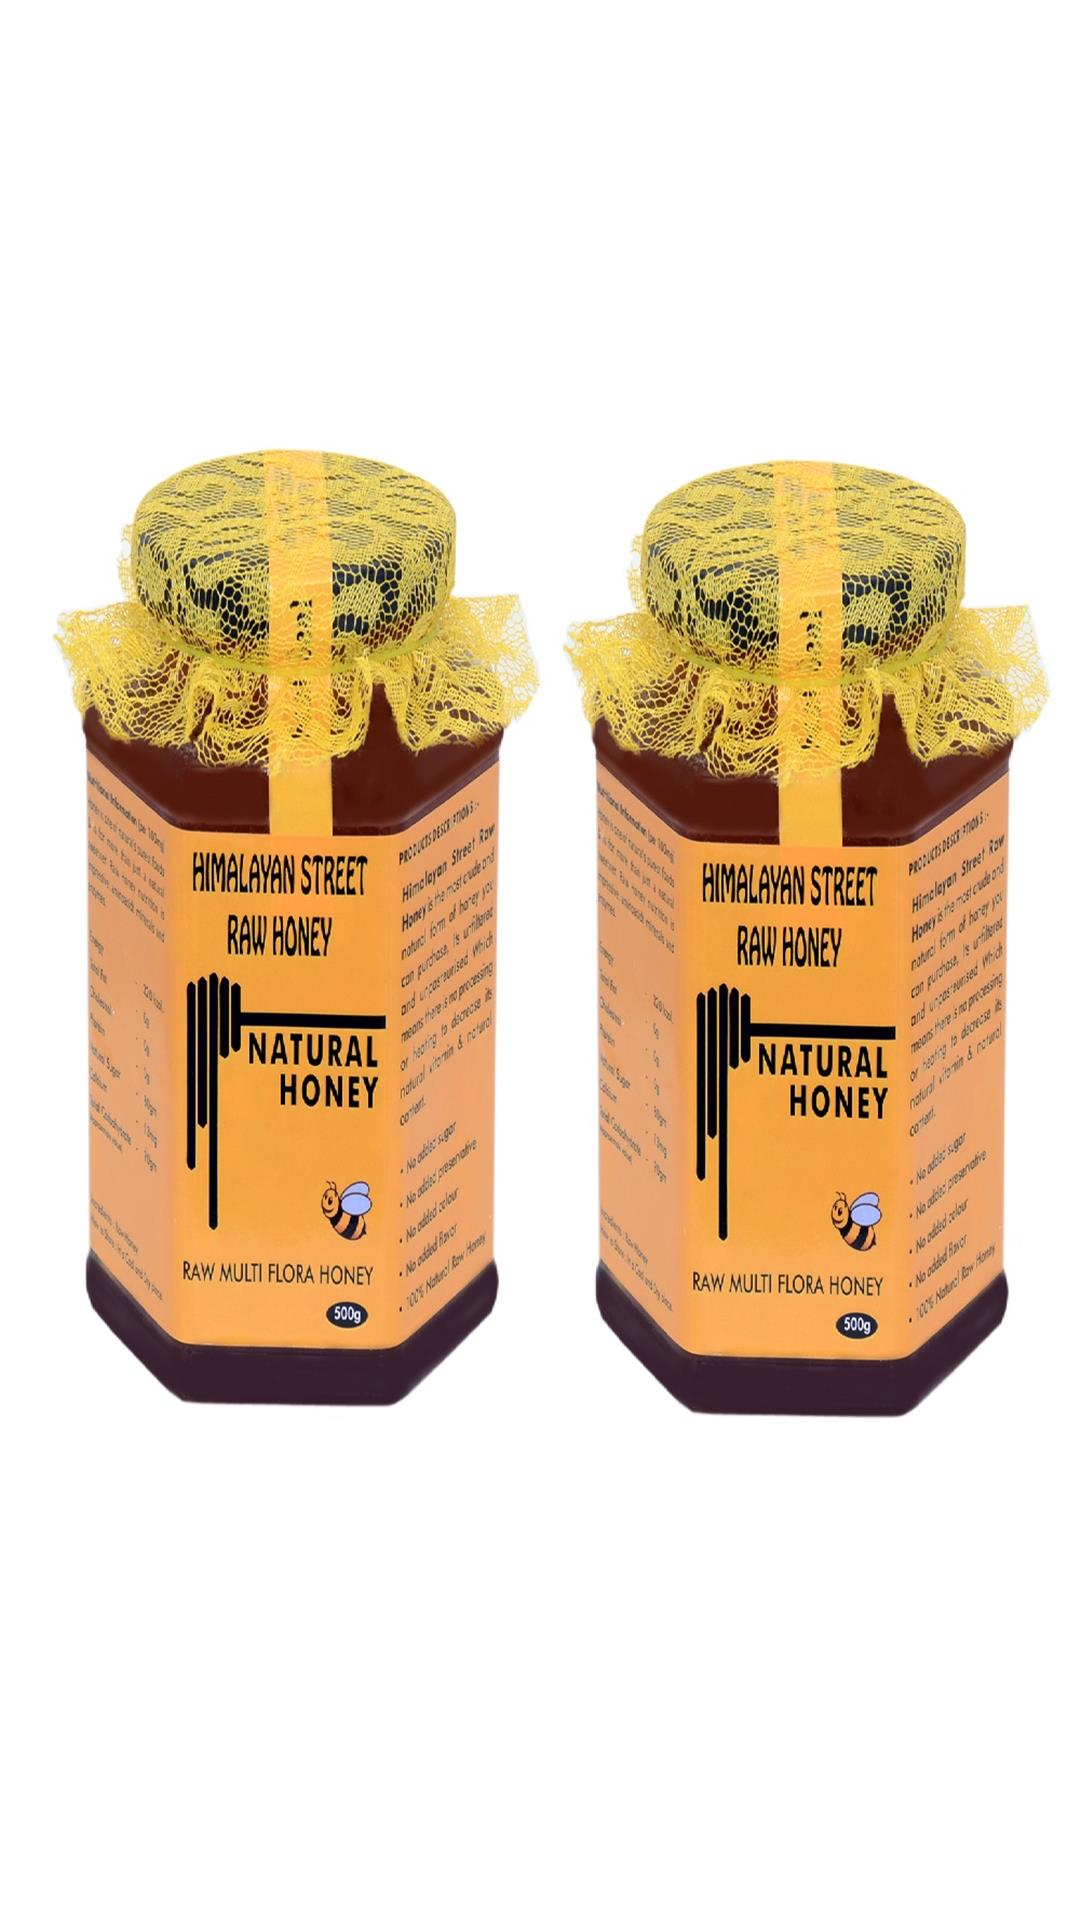 Himalayan Street Raw Honey unprocessed Raw Multi Flora Honey, 100% Natural Honey (Pack of 2 )500gm X 2